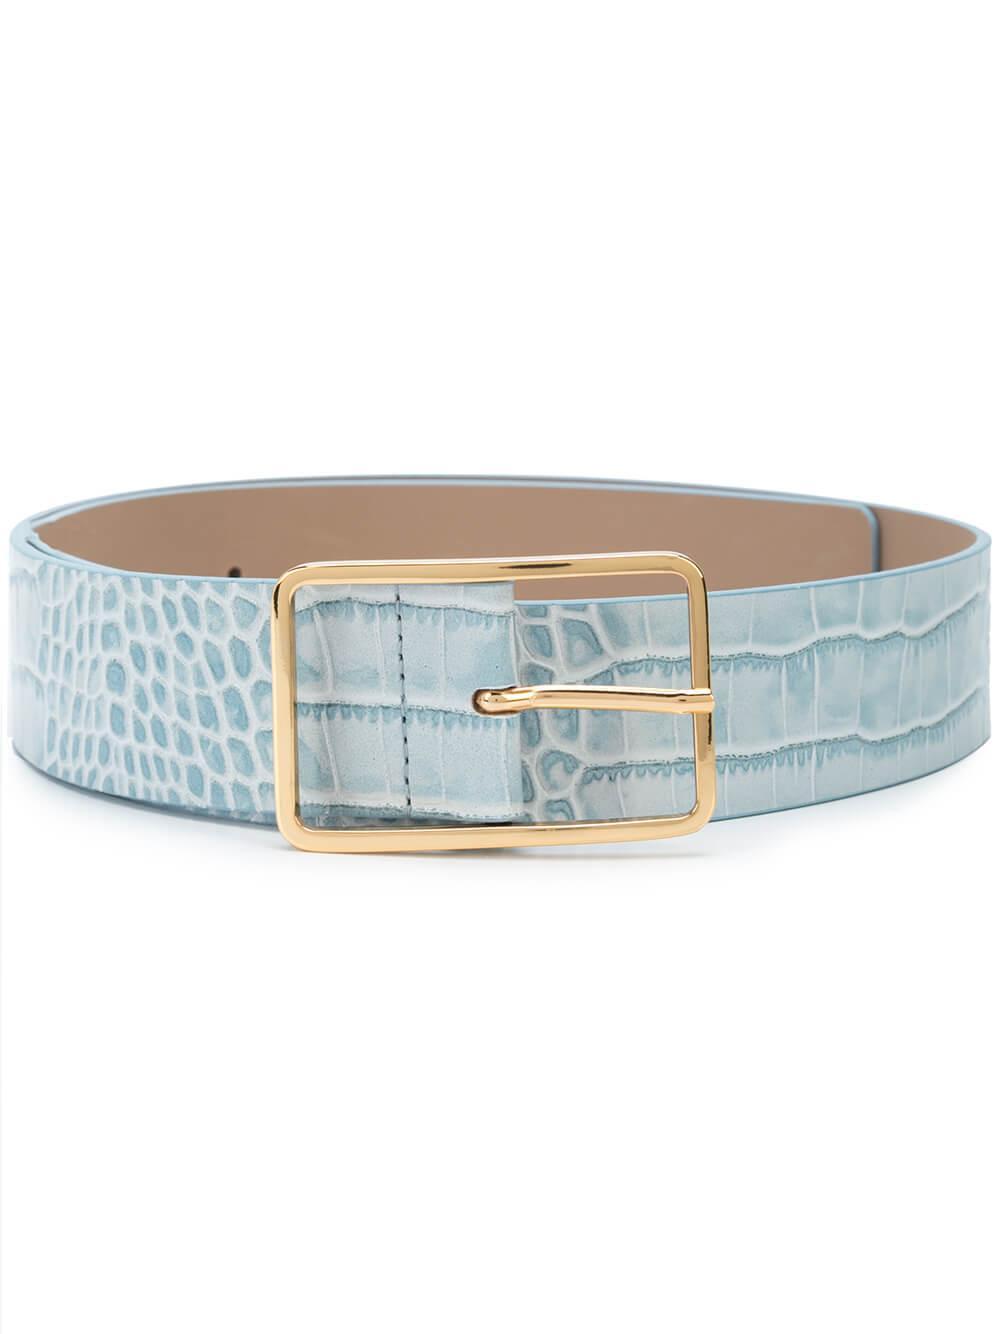 Milla Croco Belt Item # BT1640-710LE-S20